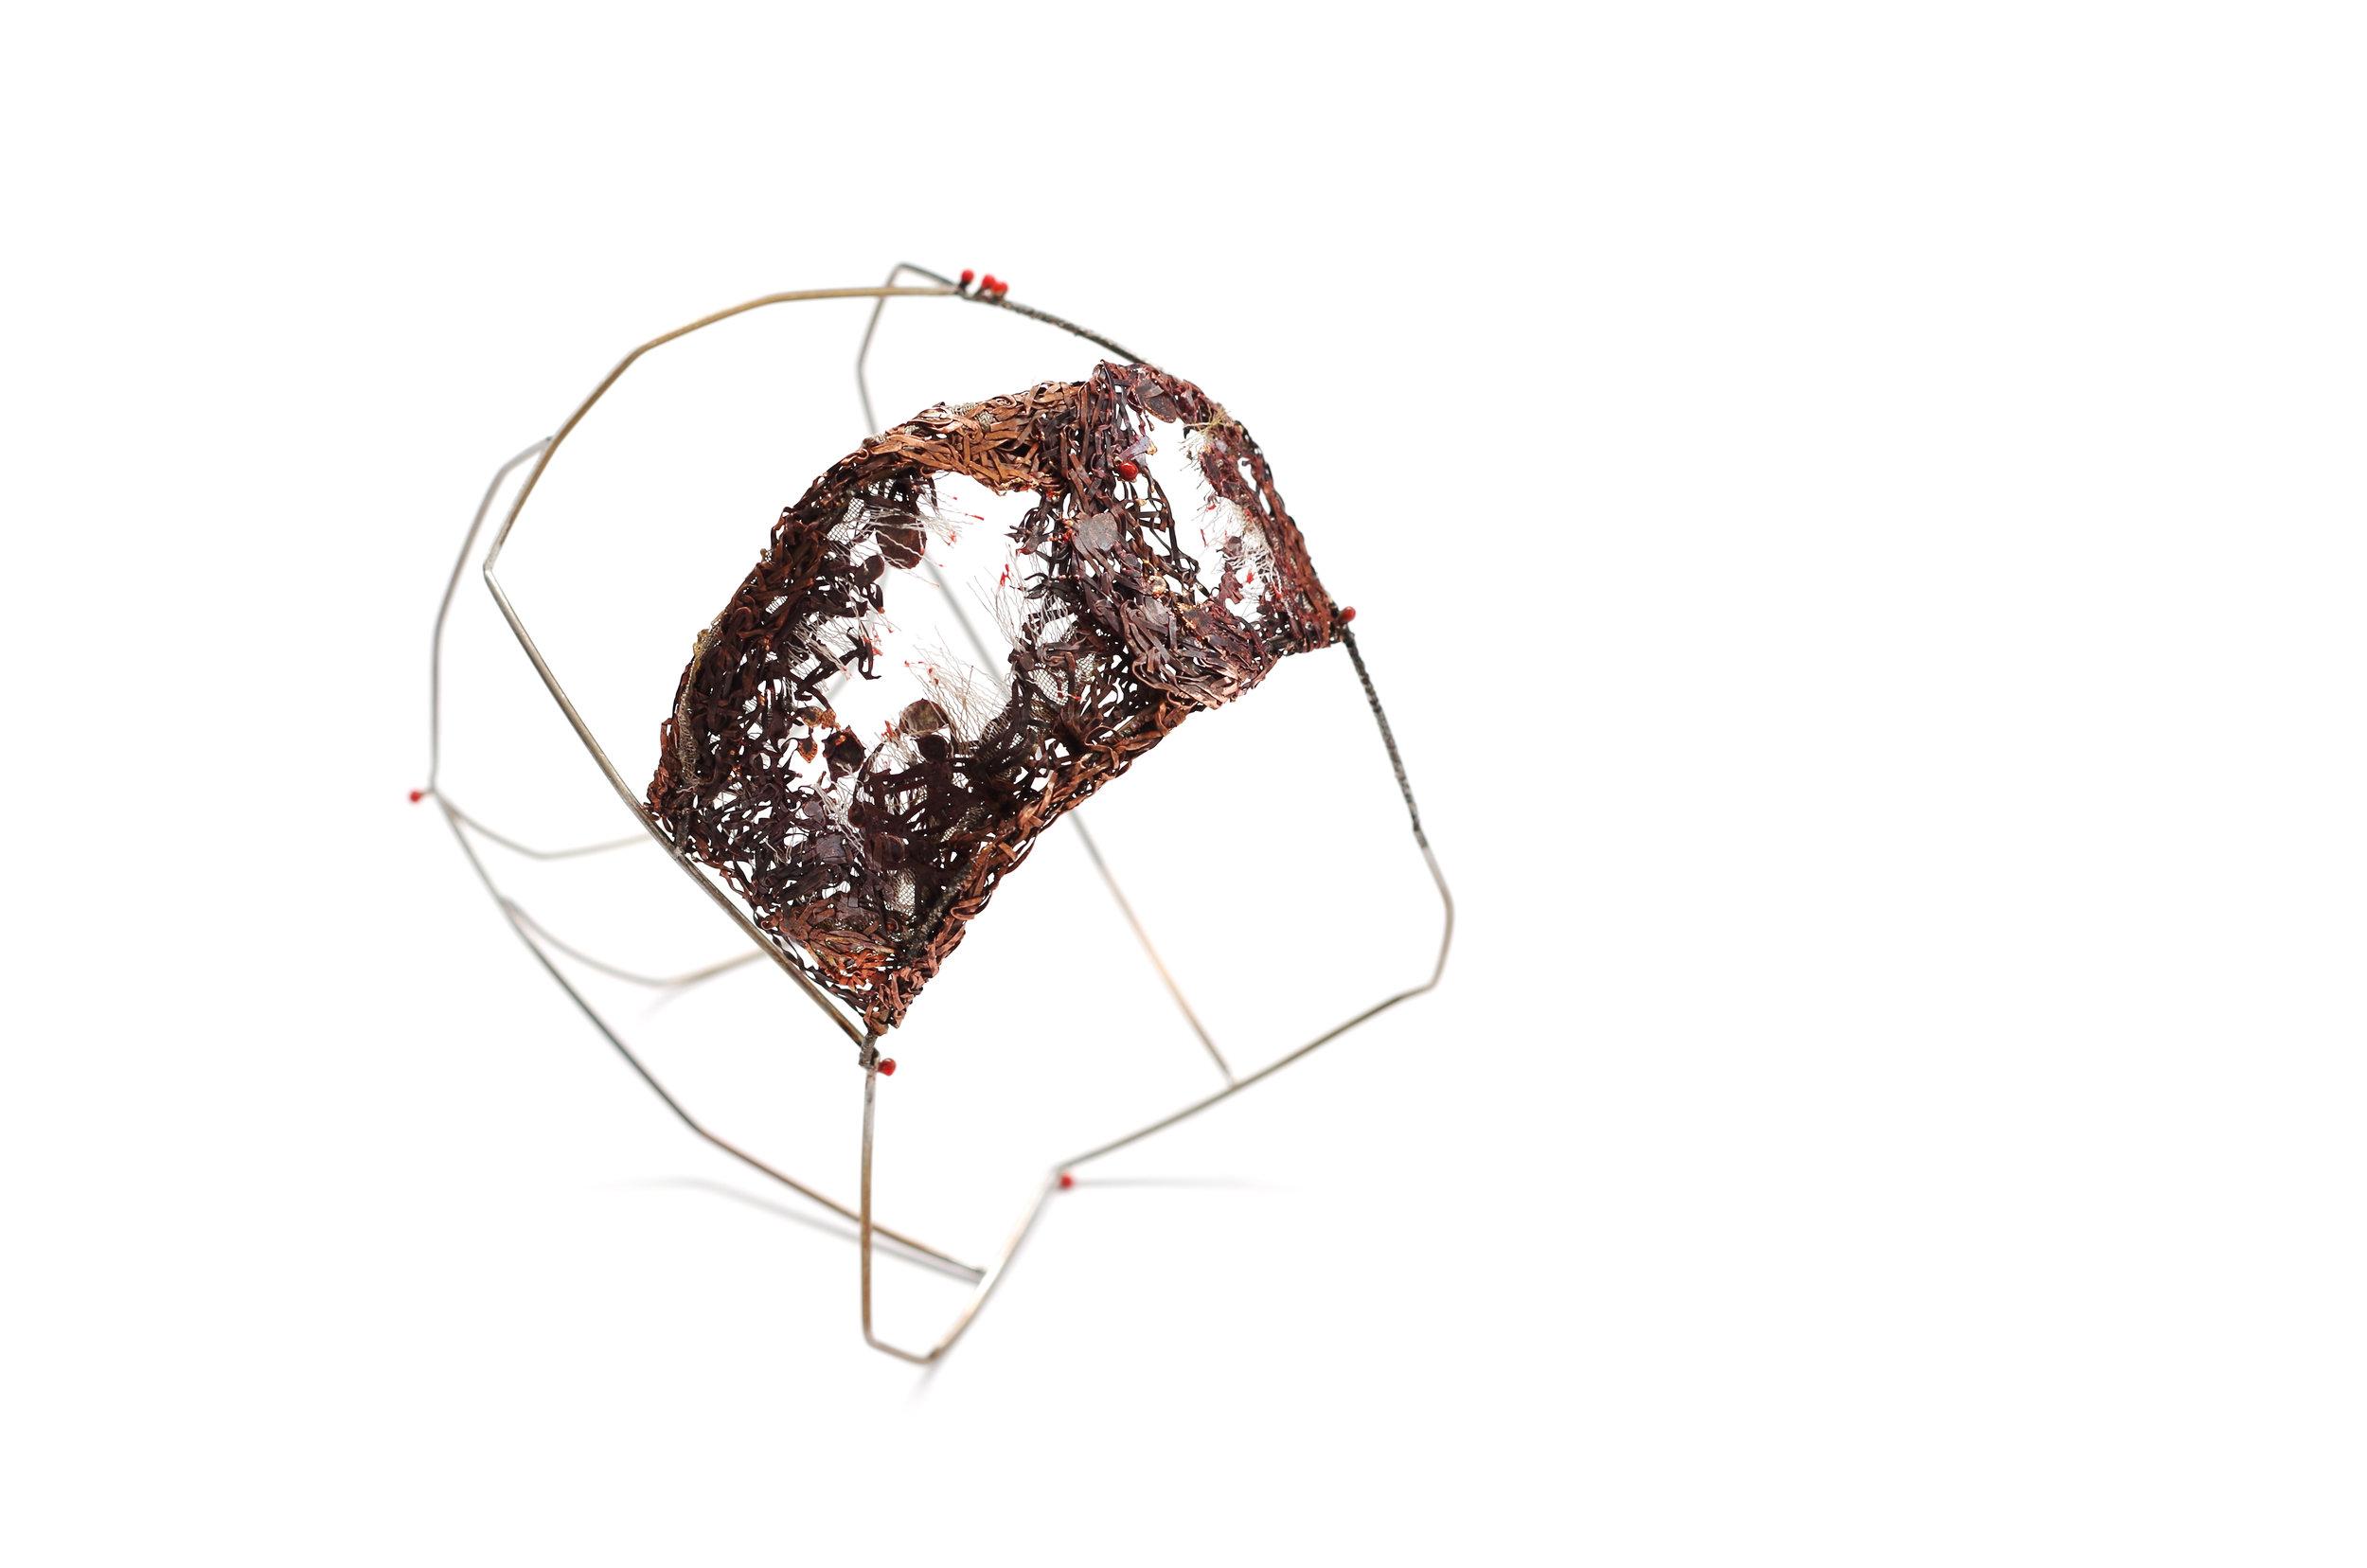 aelita ba graduate collection crochet contemporary jewellery